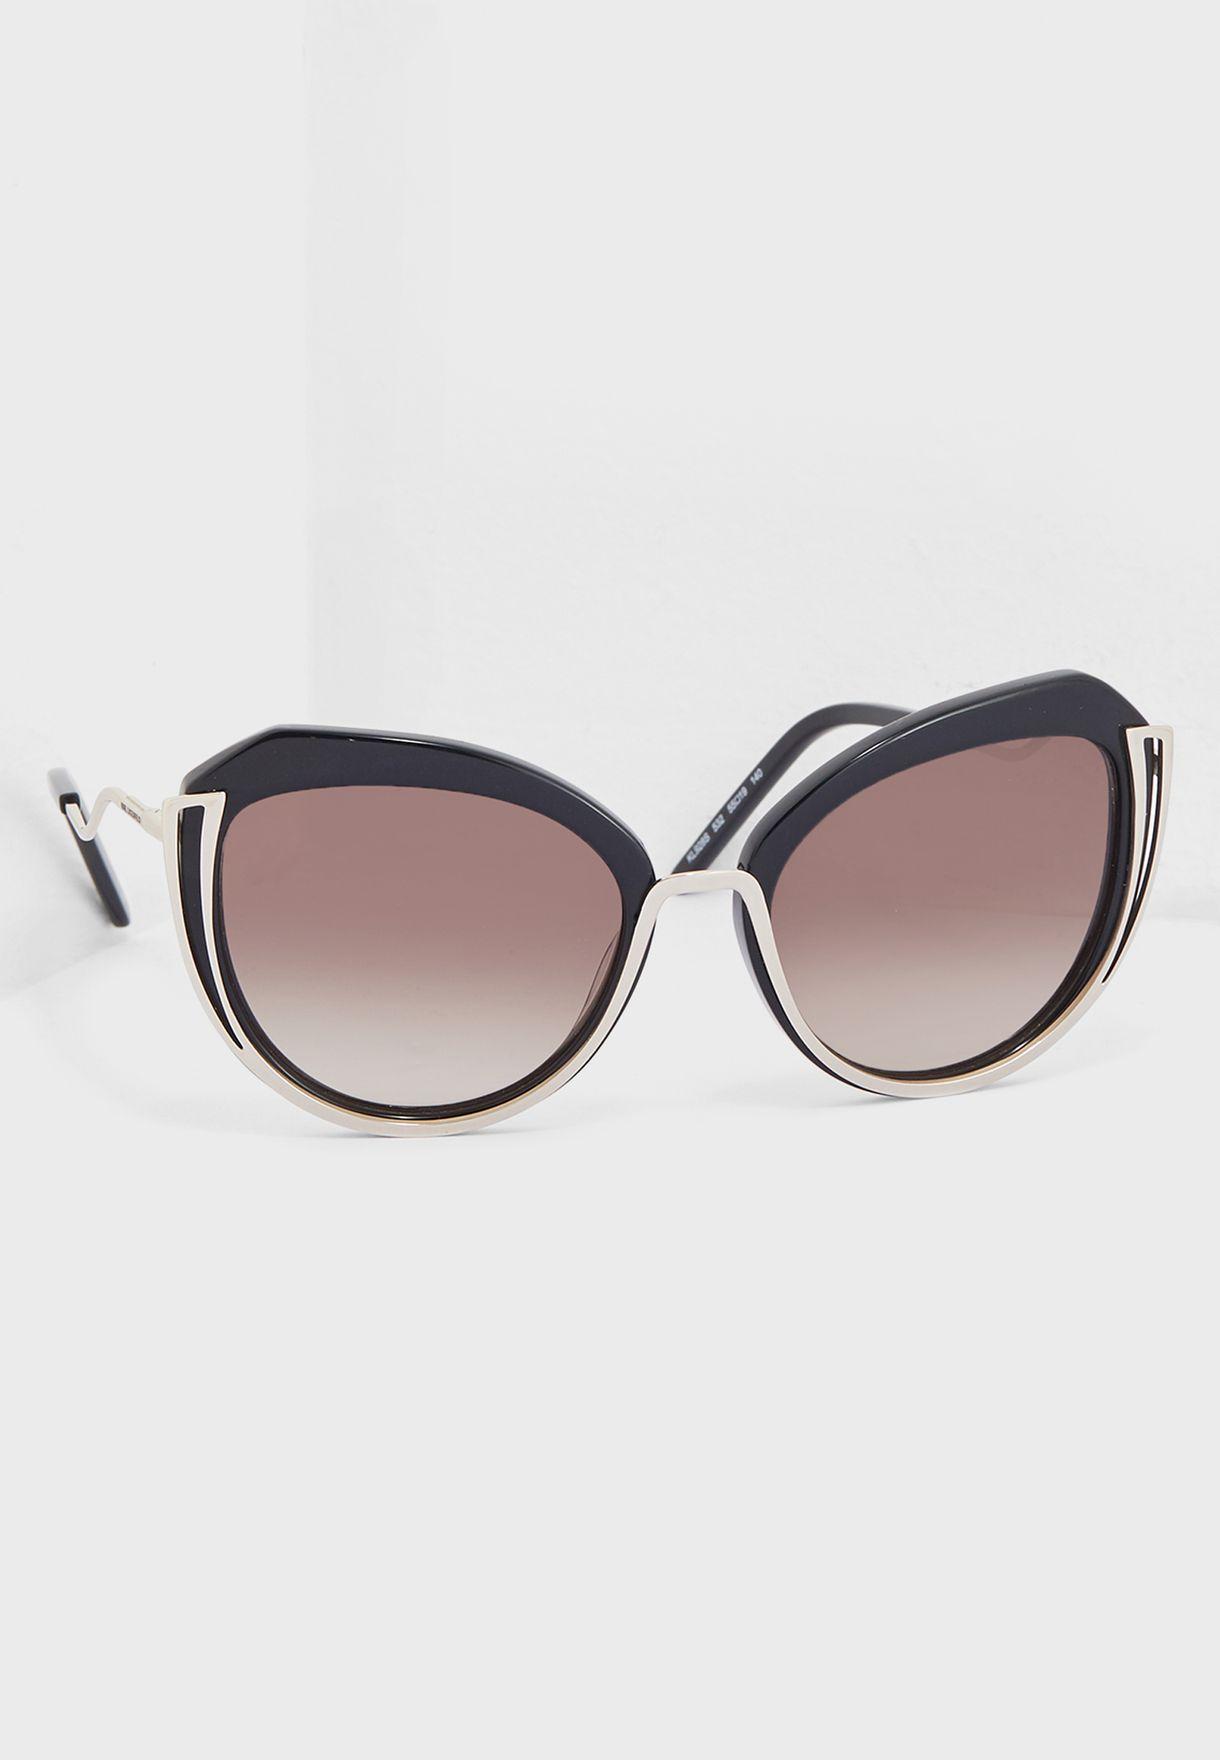 KL928S Oval Sunglasses